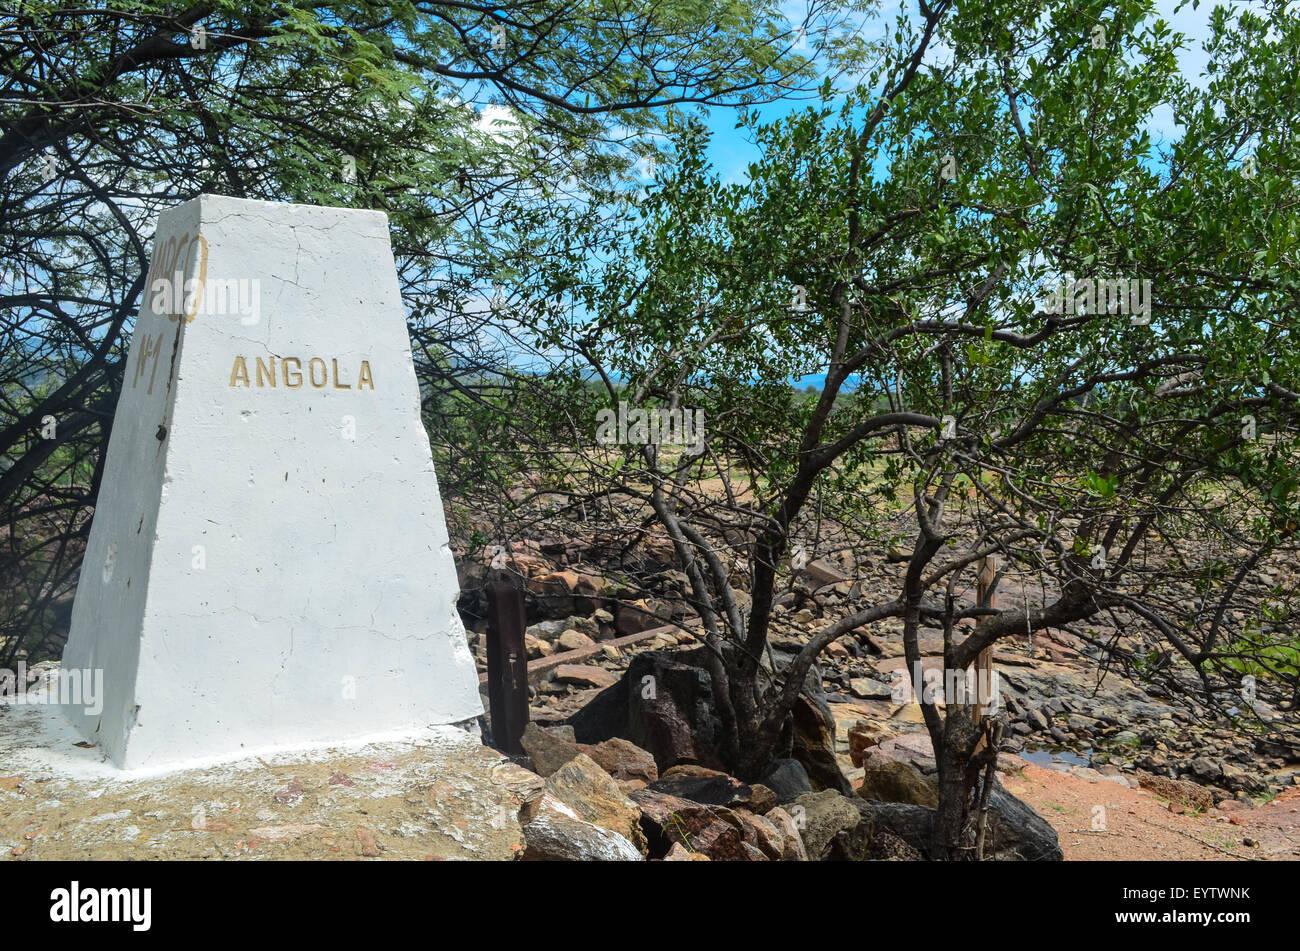 Milestone reading 'Angola' at the Ruacana dam, at the border Angola/Namibia - Stock Image